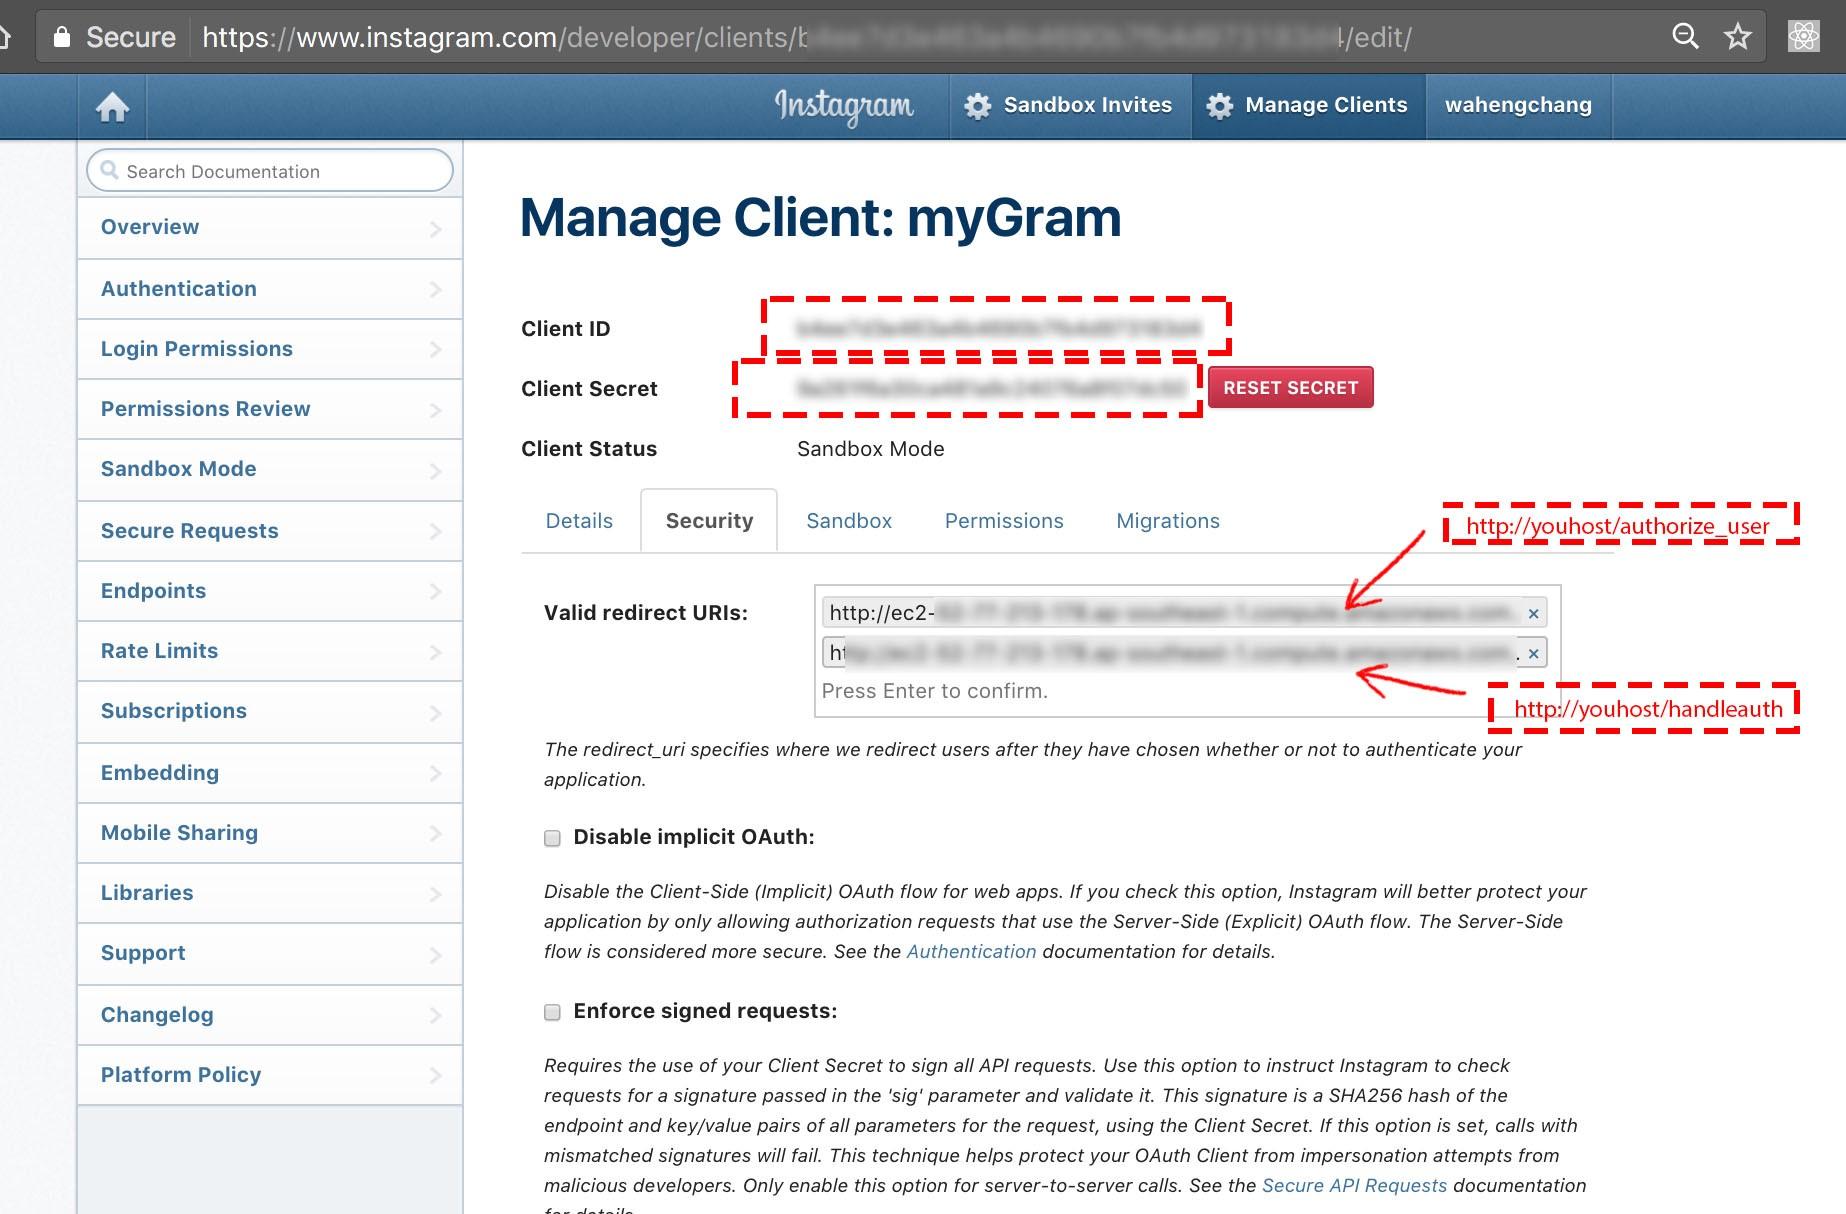 /instagramapi-set-up-nodejs-server-access-token-in-2-step-instagram-oauth-auth-access-token-tutorial-example-34c66039cffc feature image